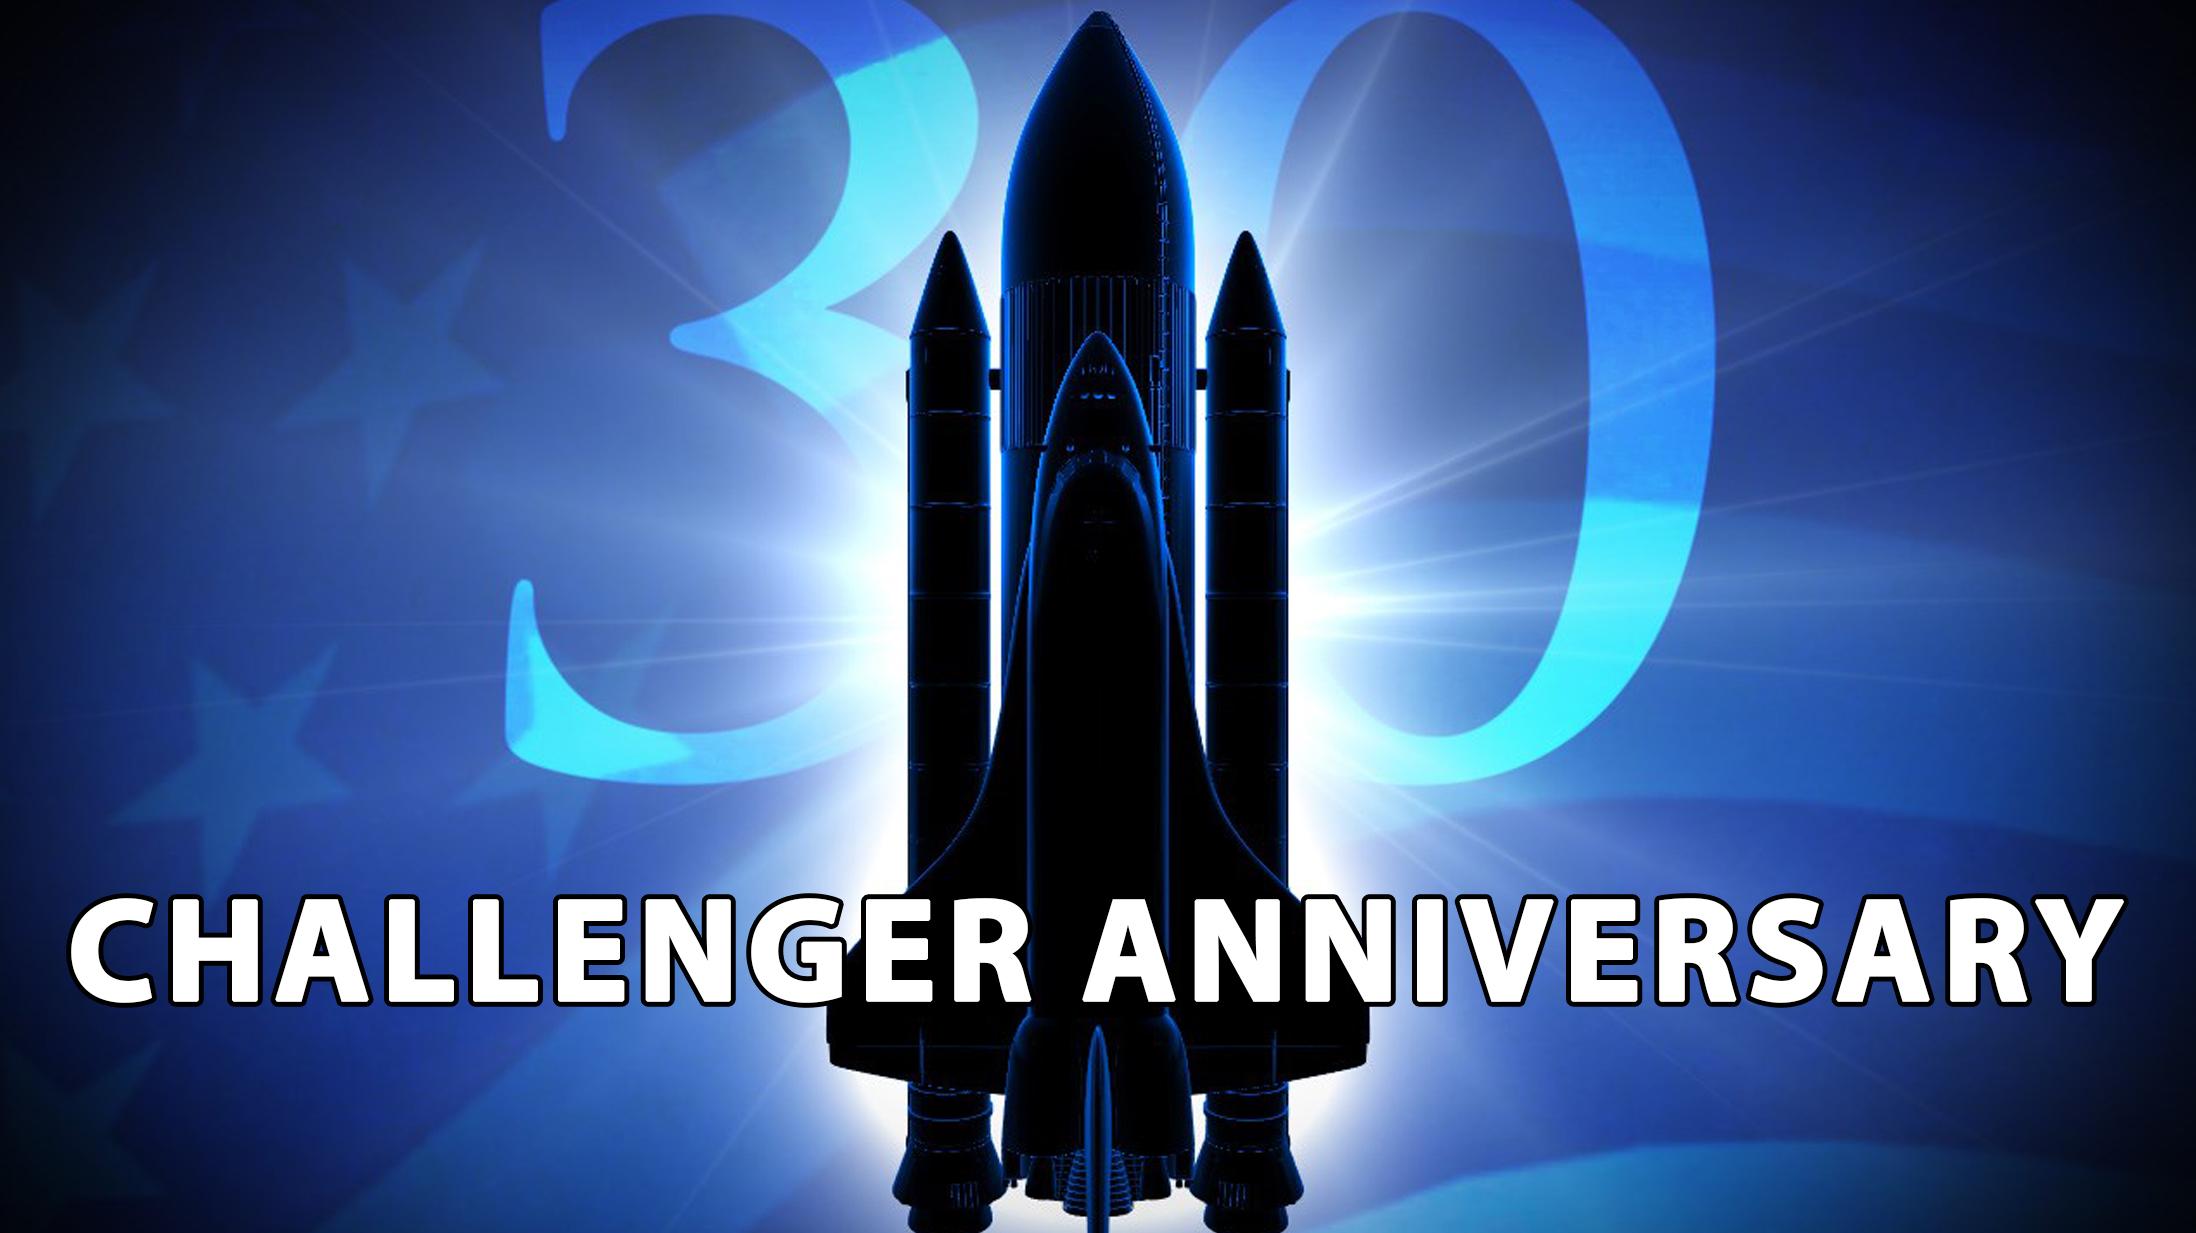 Challenger Anniversary_1454025641371.jpg